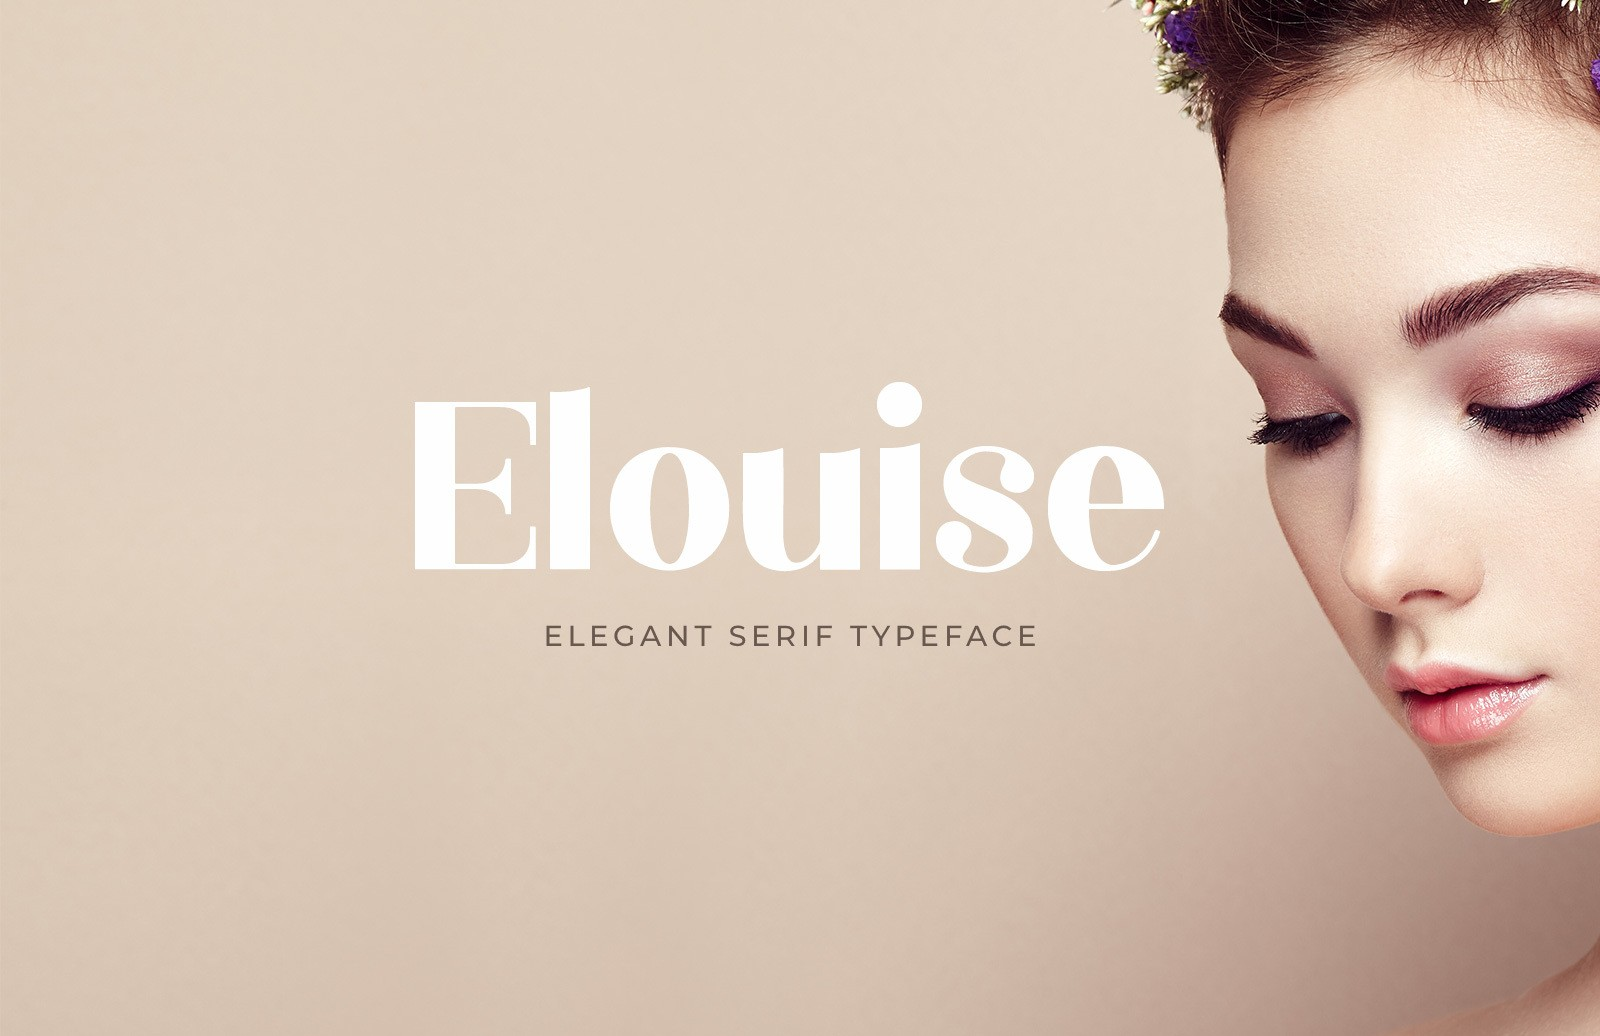 Elouise Serif Font Preview 1